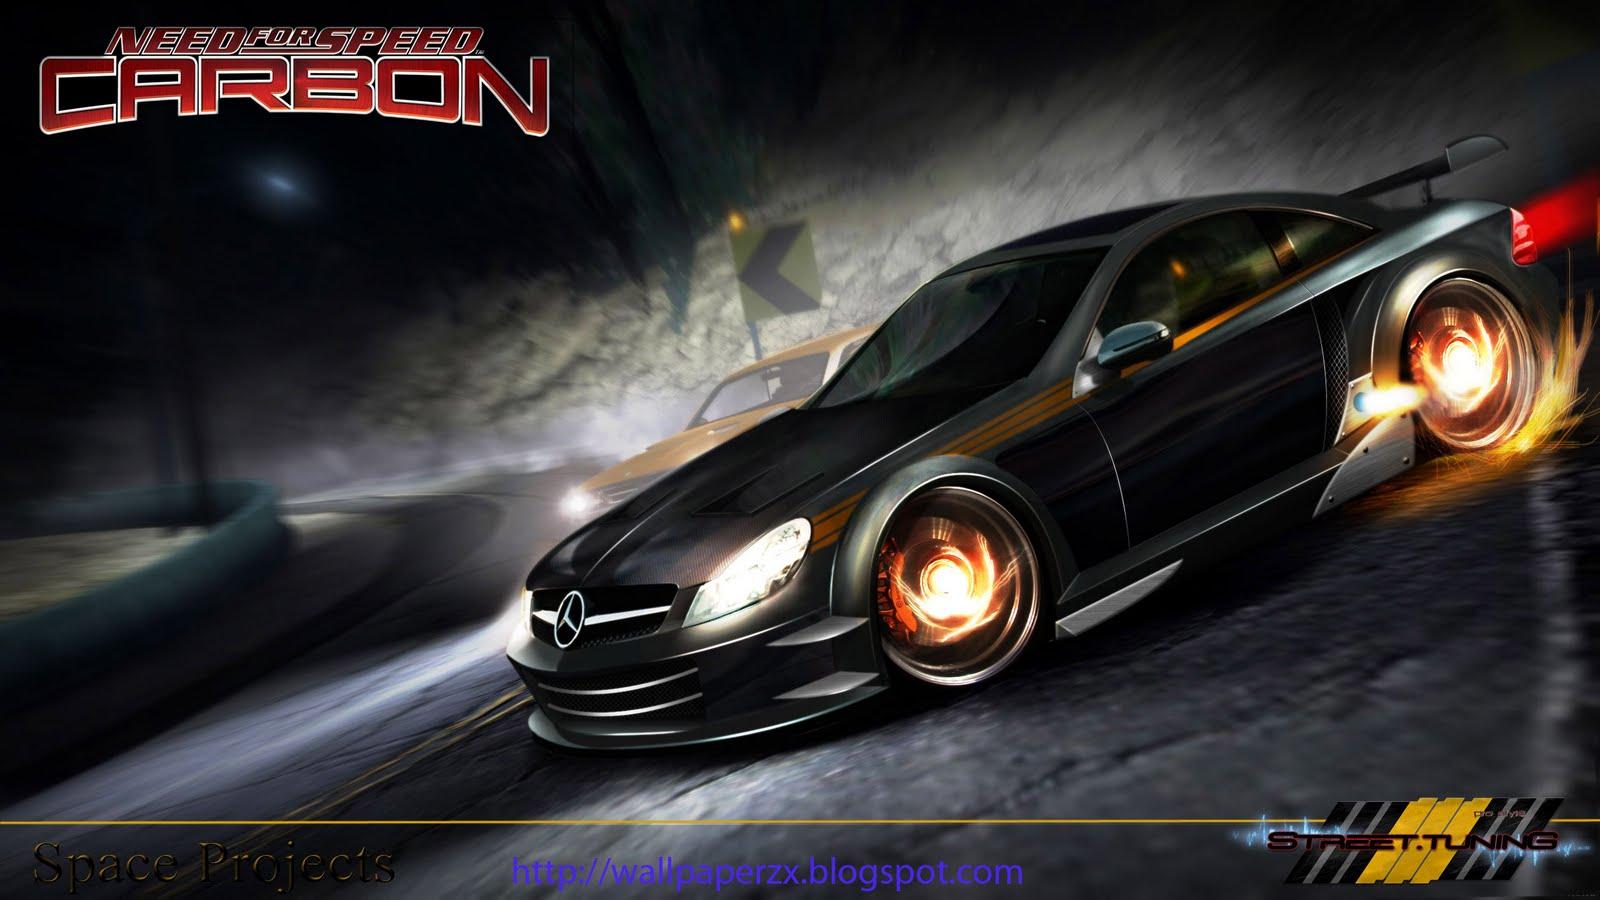 48 Need For Speed Wallpaper Cars On Wallpapersafari